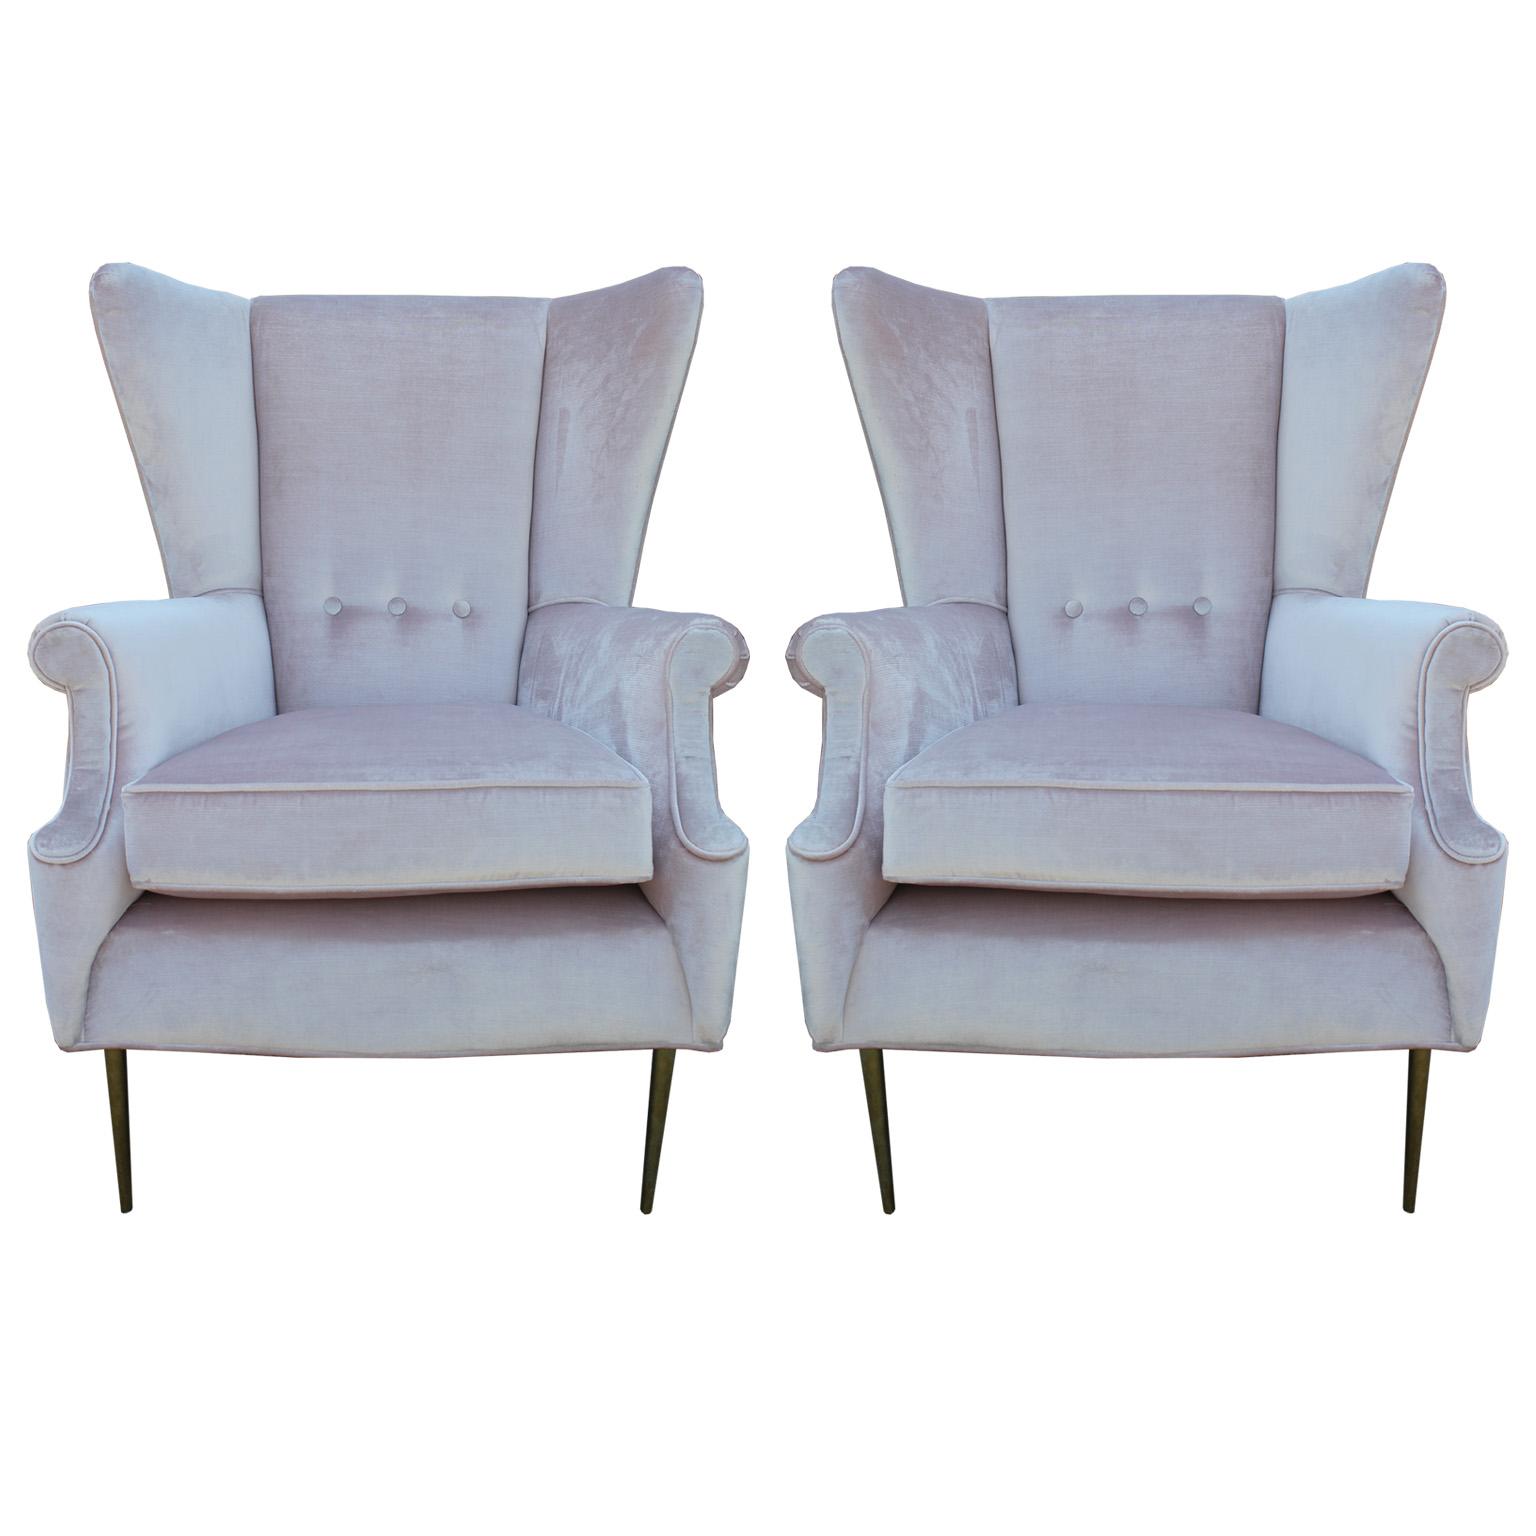 Luxe Pair of Brass Legged Italian Wingback Chairs : pink wingback2 1 from www.reevesantiqueshouston.com size 1536 x 1536 jpeg 257kB